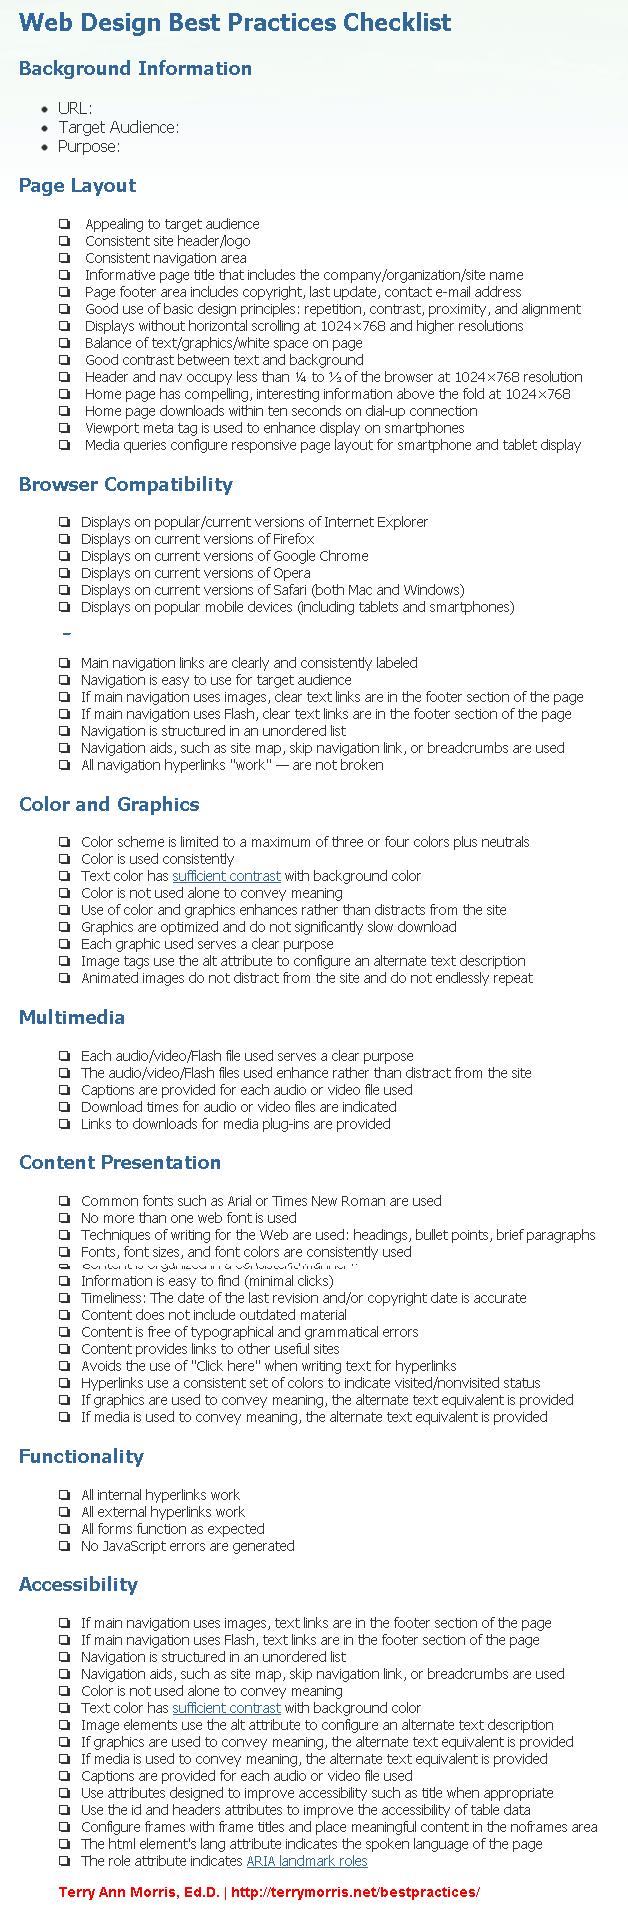 Terry Morris Web Design Best Practices Checklist Web Design Business Infographic Web Development Design